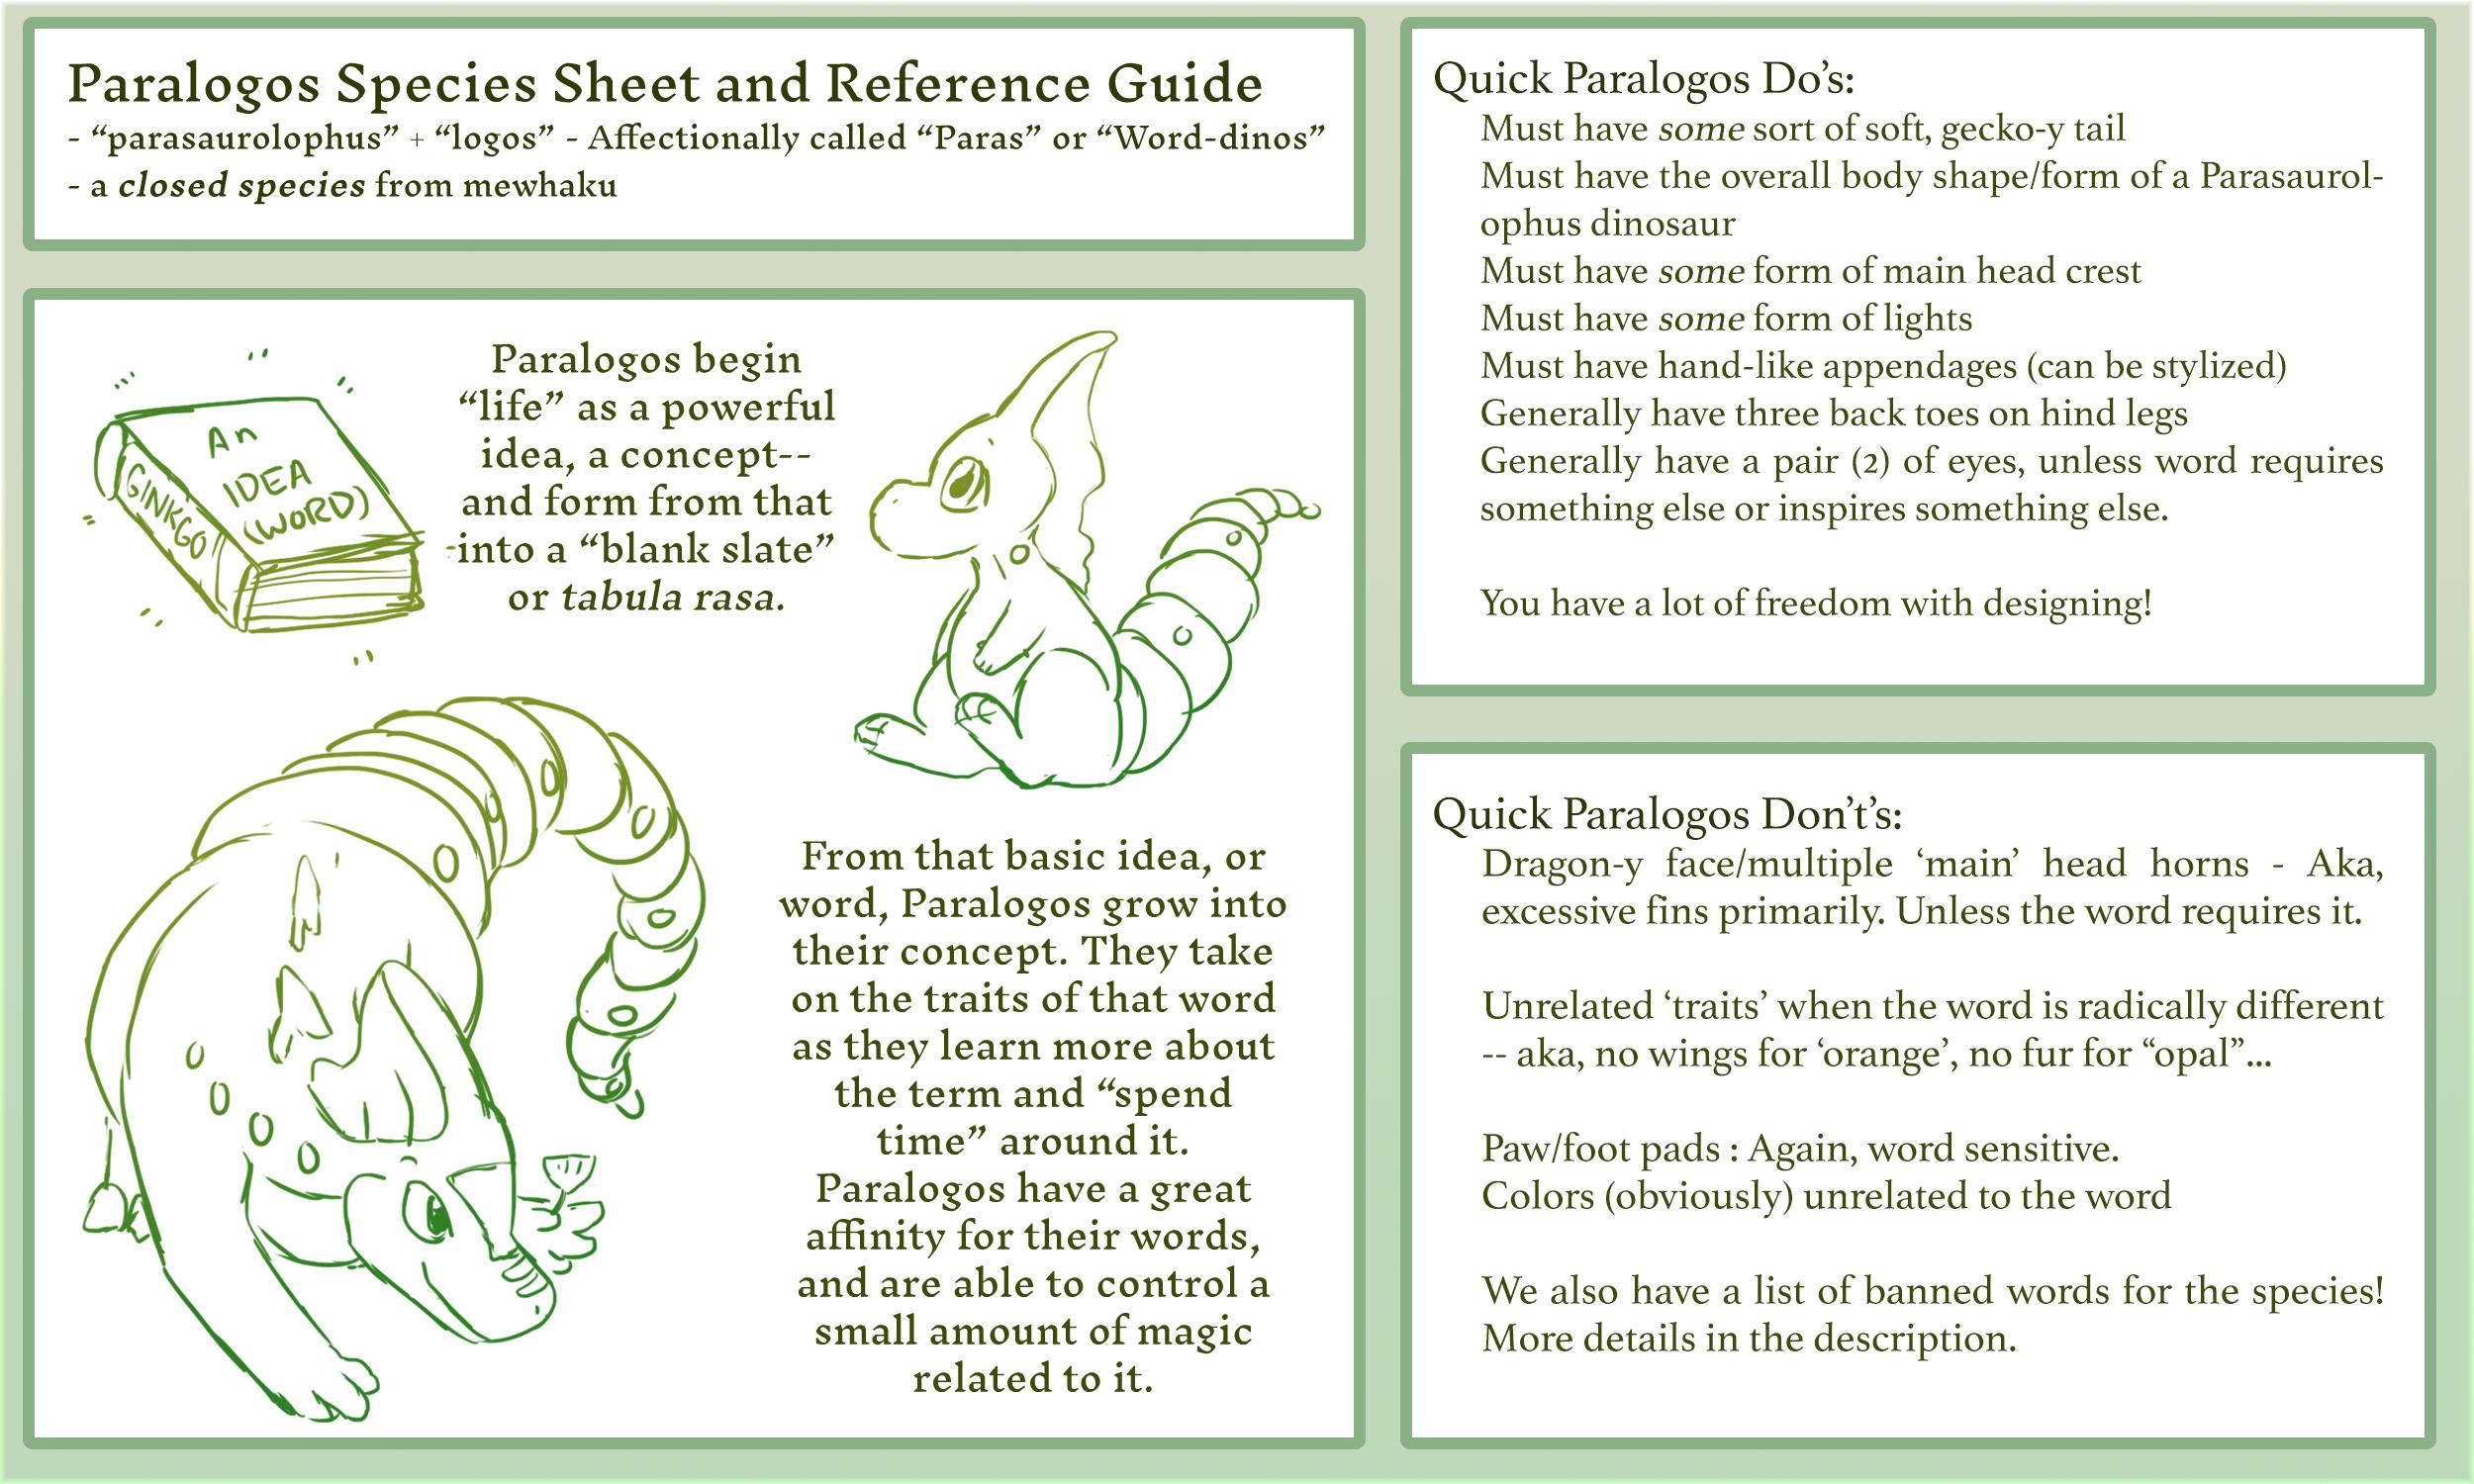 [Paralogos] Species Sheet + Guide